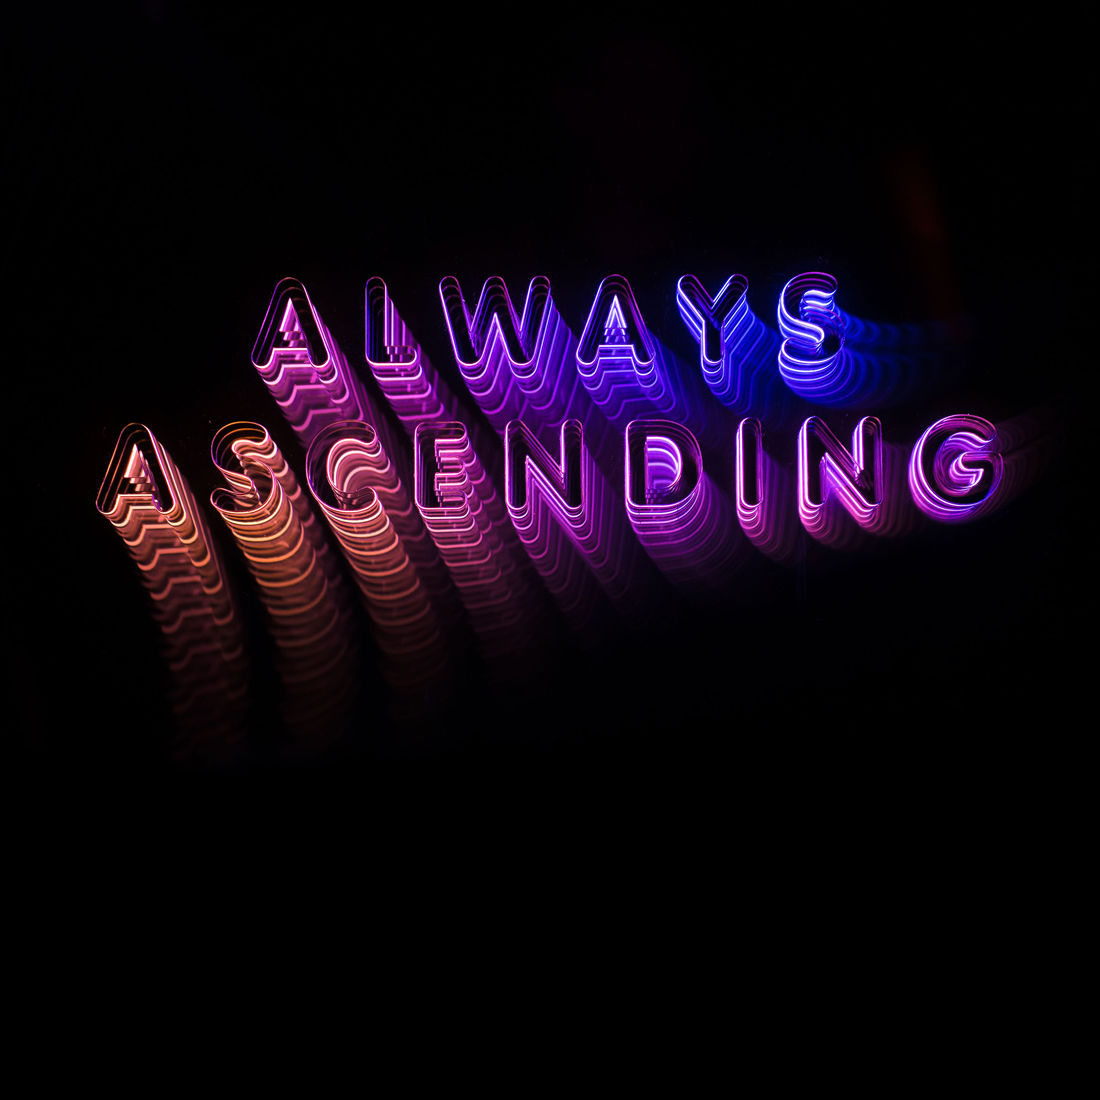 alwaysascending